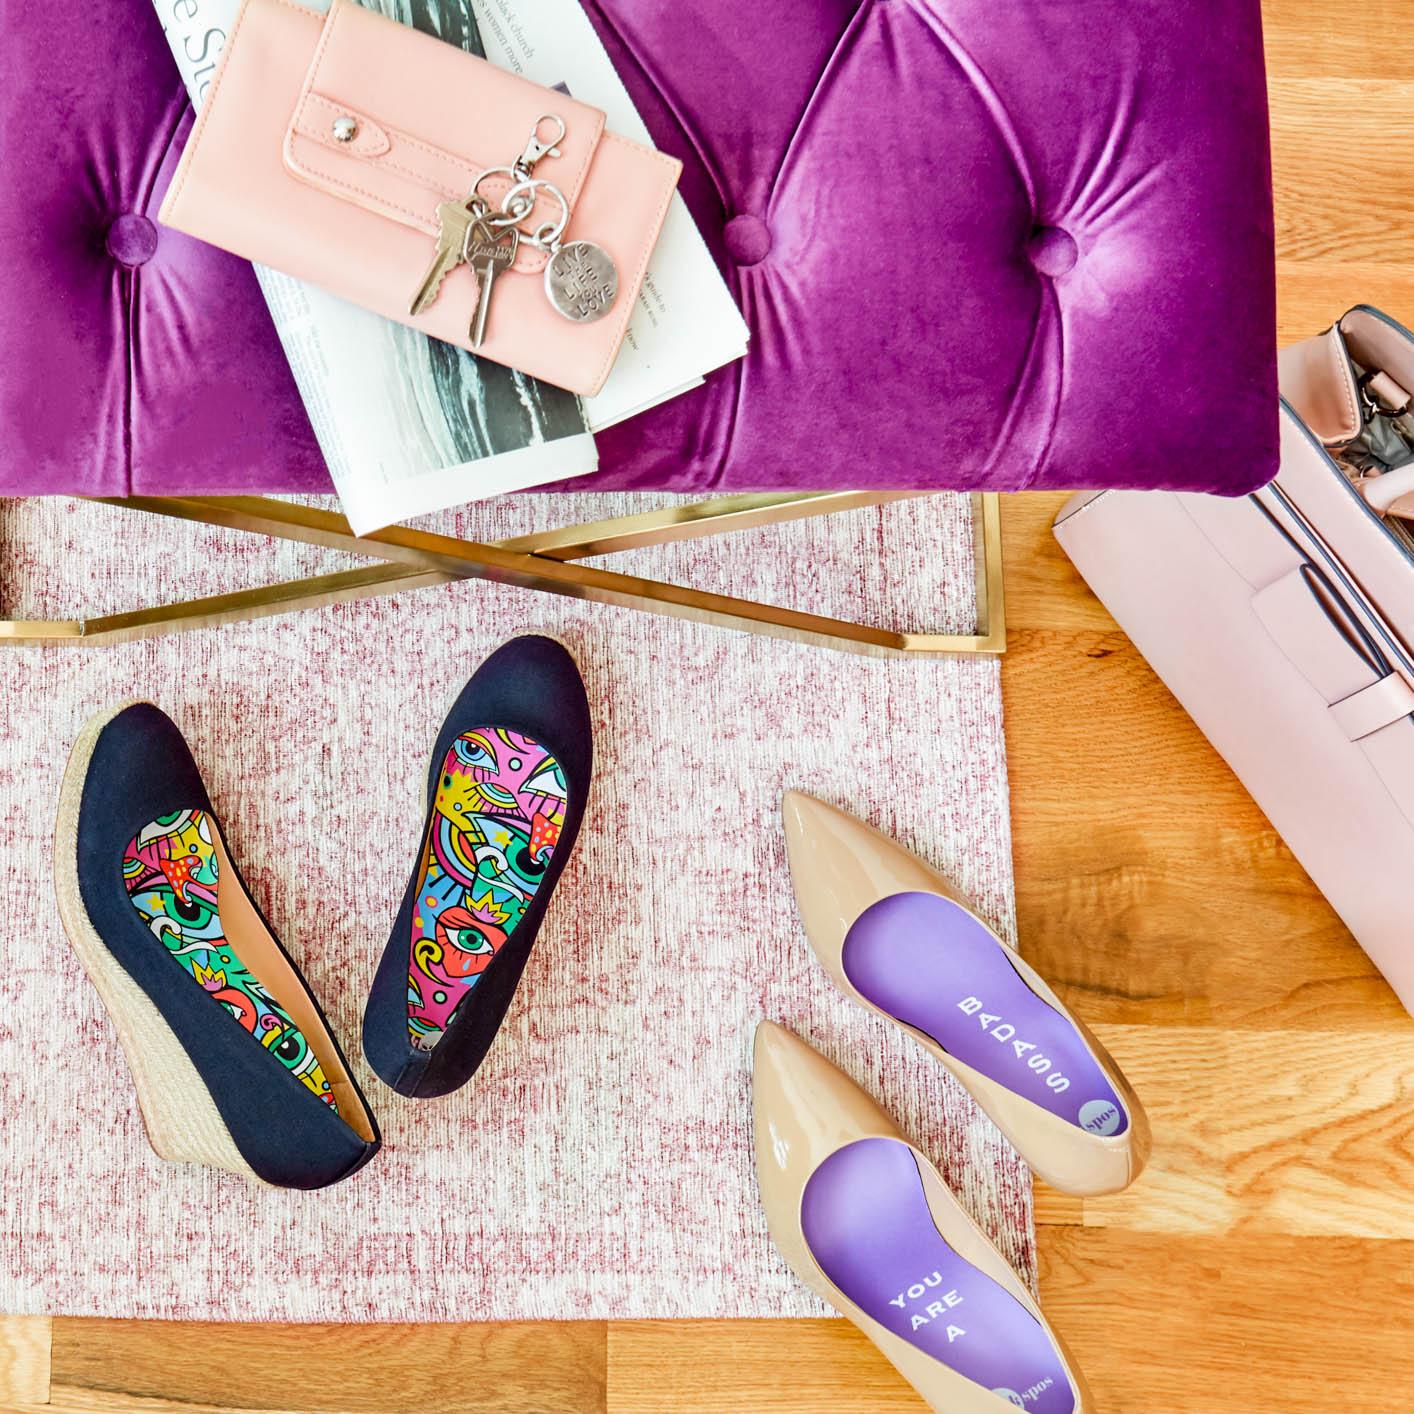 kickspos-brand-photography-shoes-insoles-6.jpg